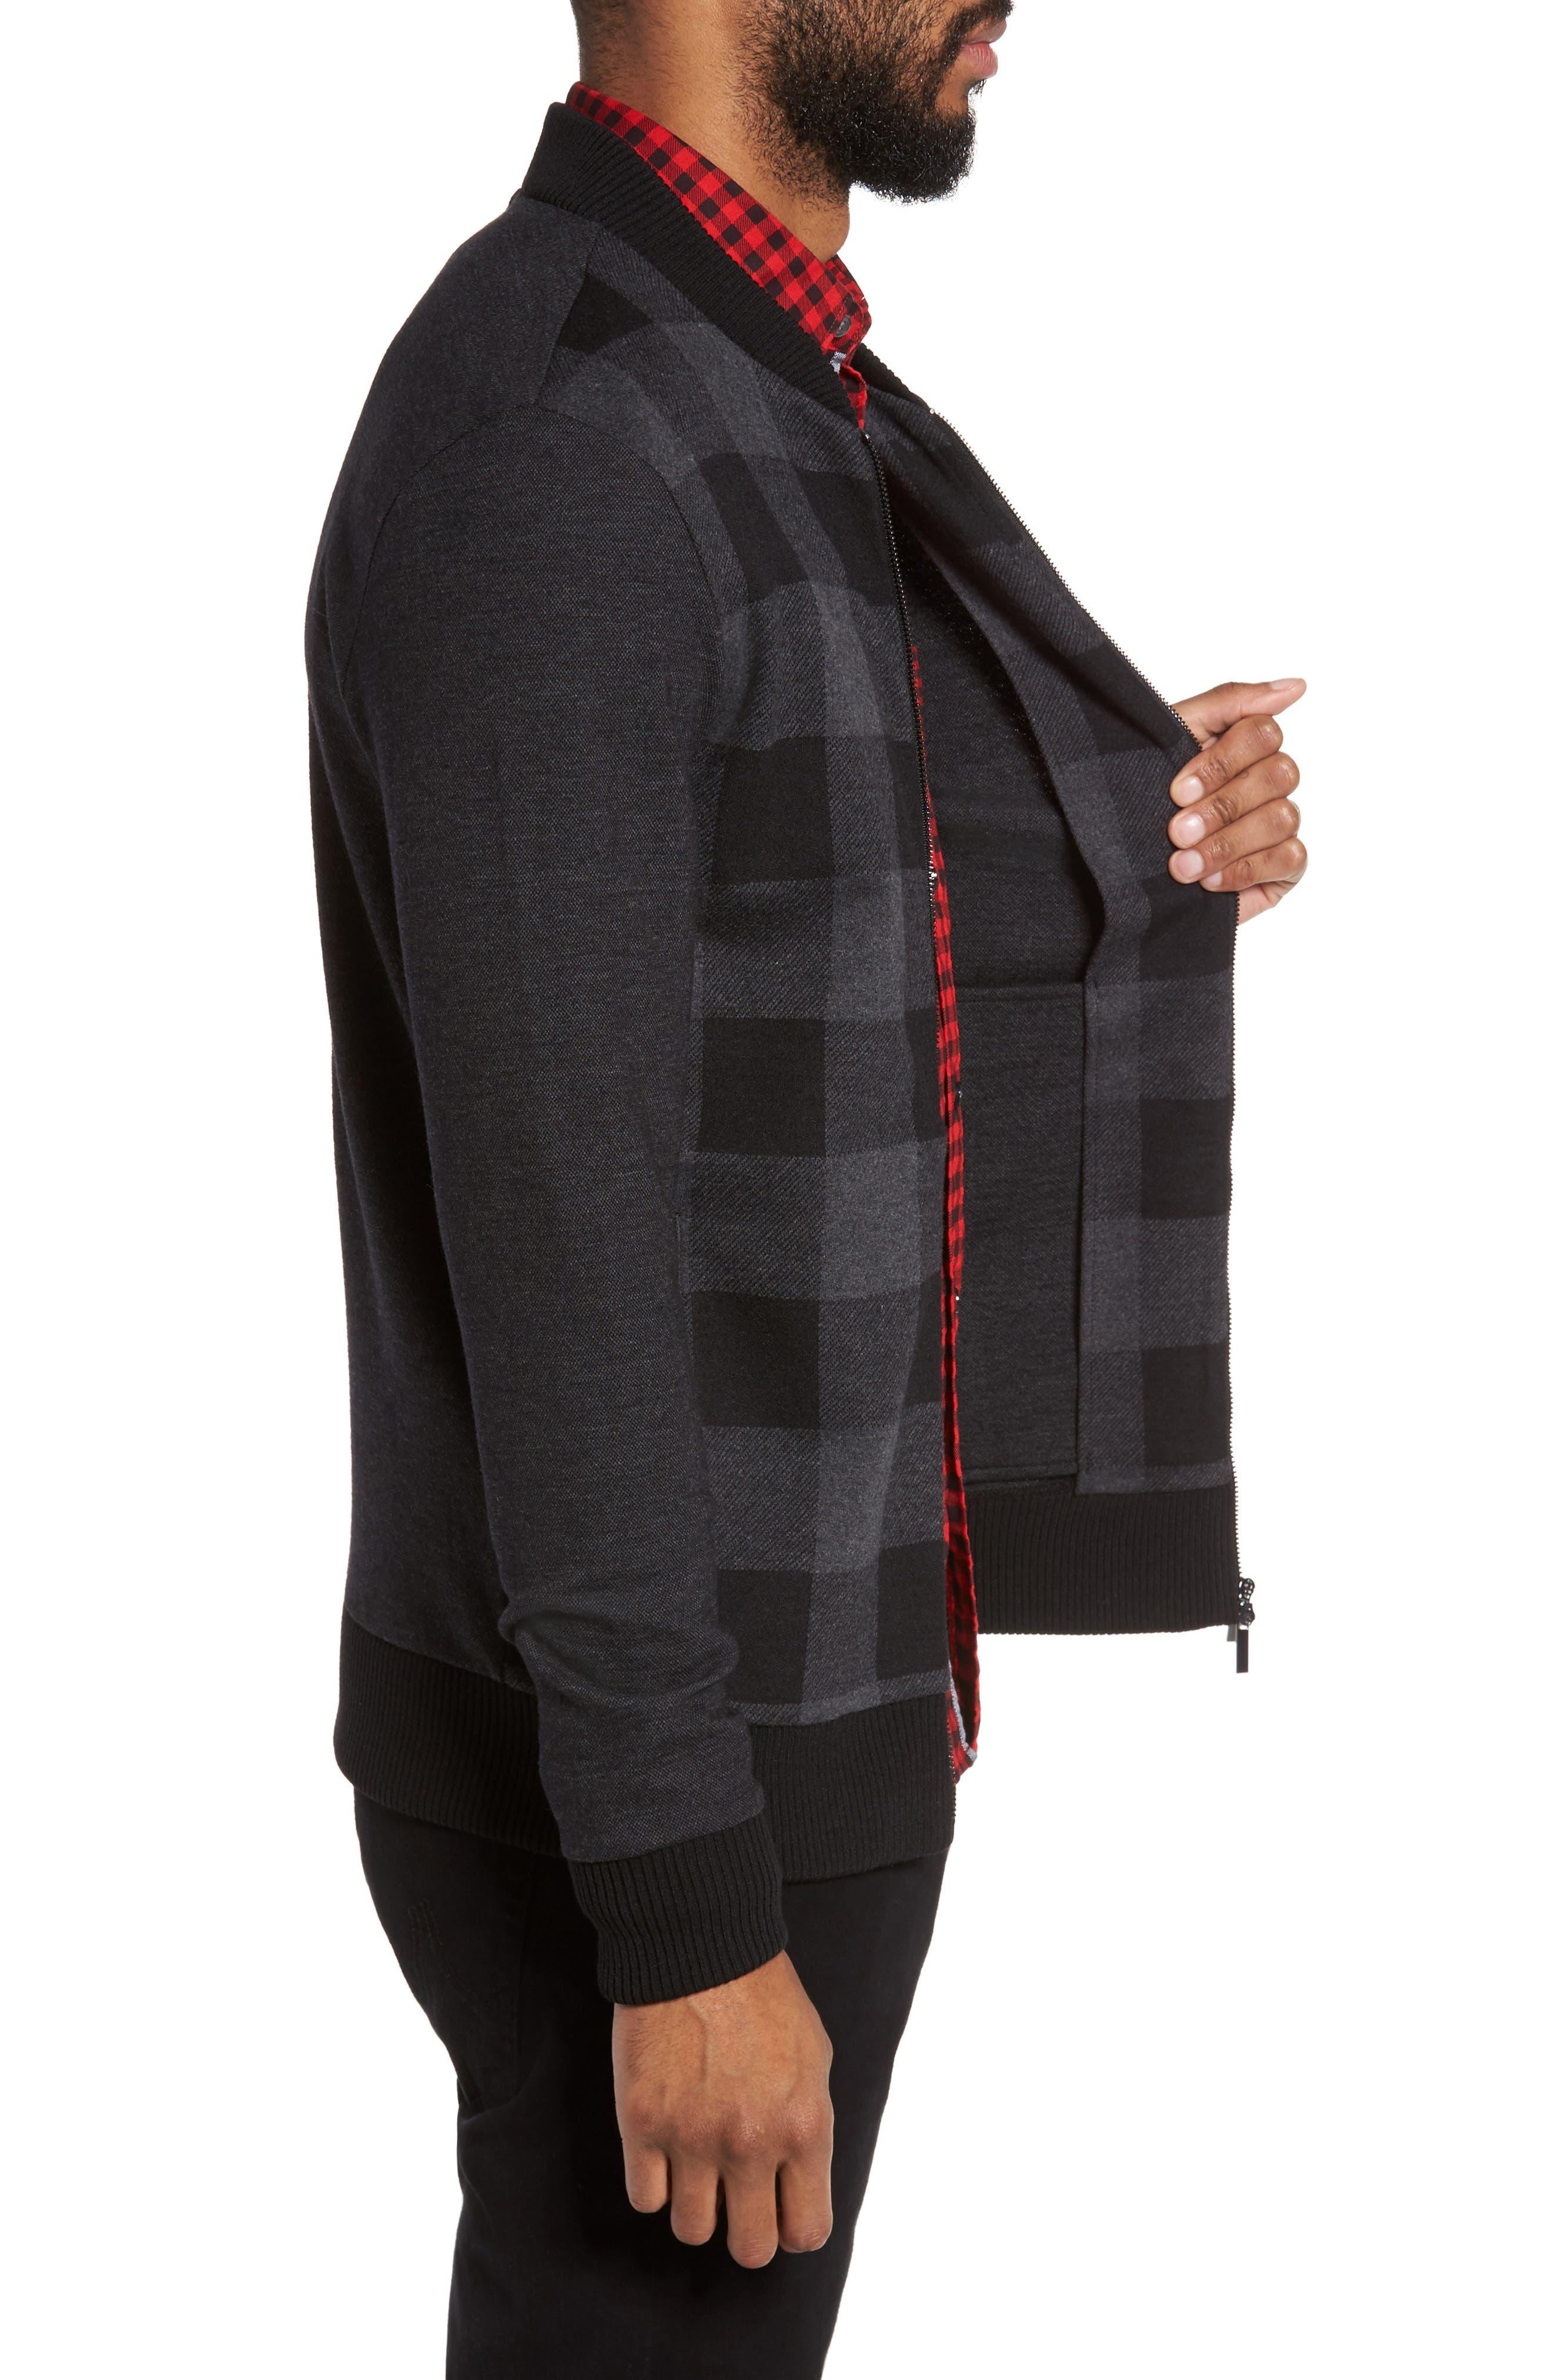 Salea Check Wool Blend Bomber Jacket,                             Alternate thumbnail 3, color,                             001